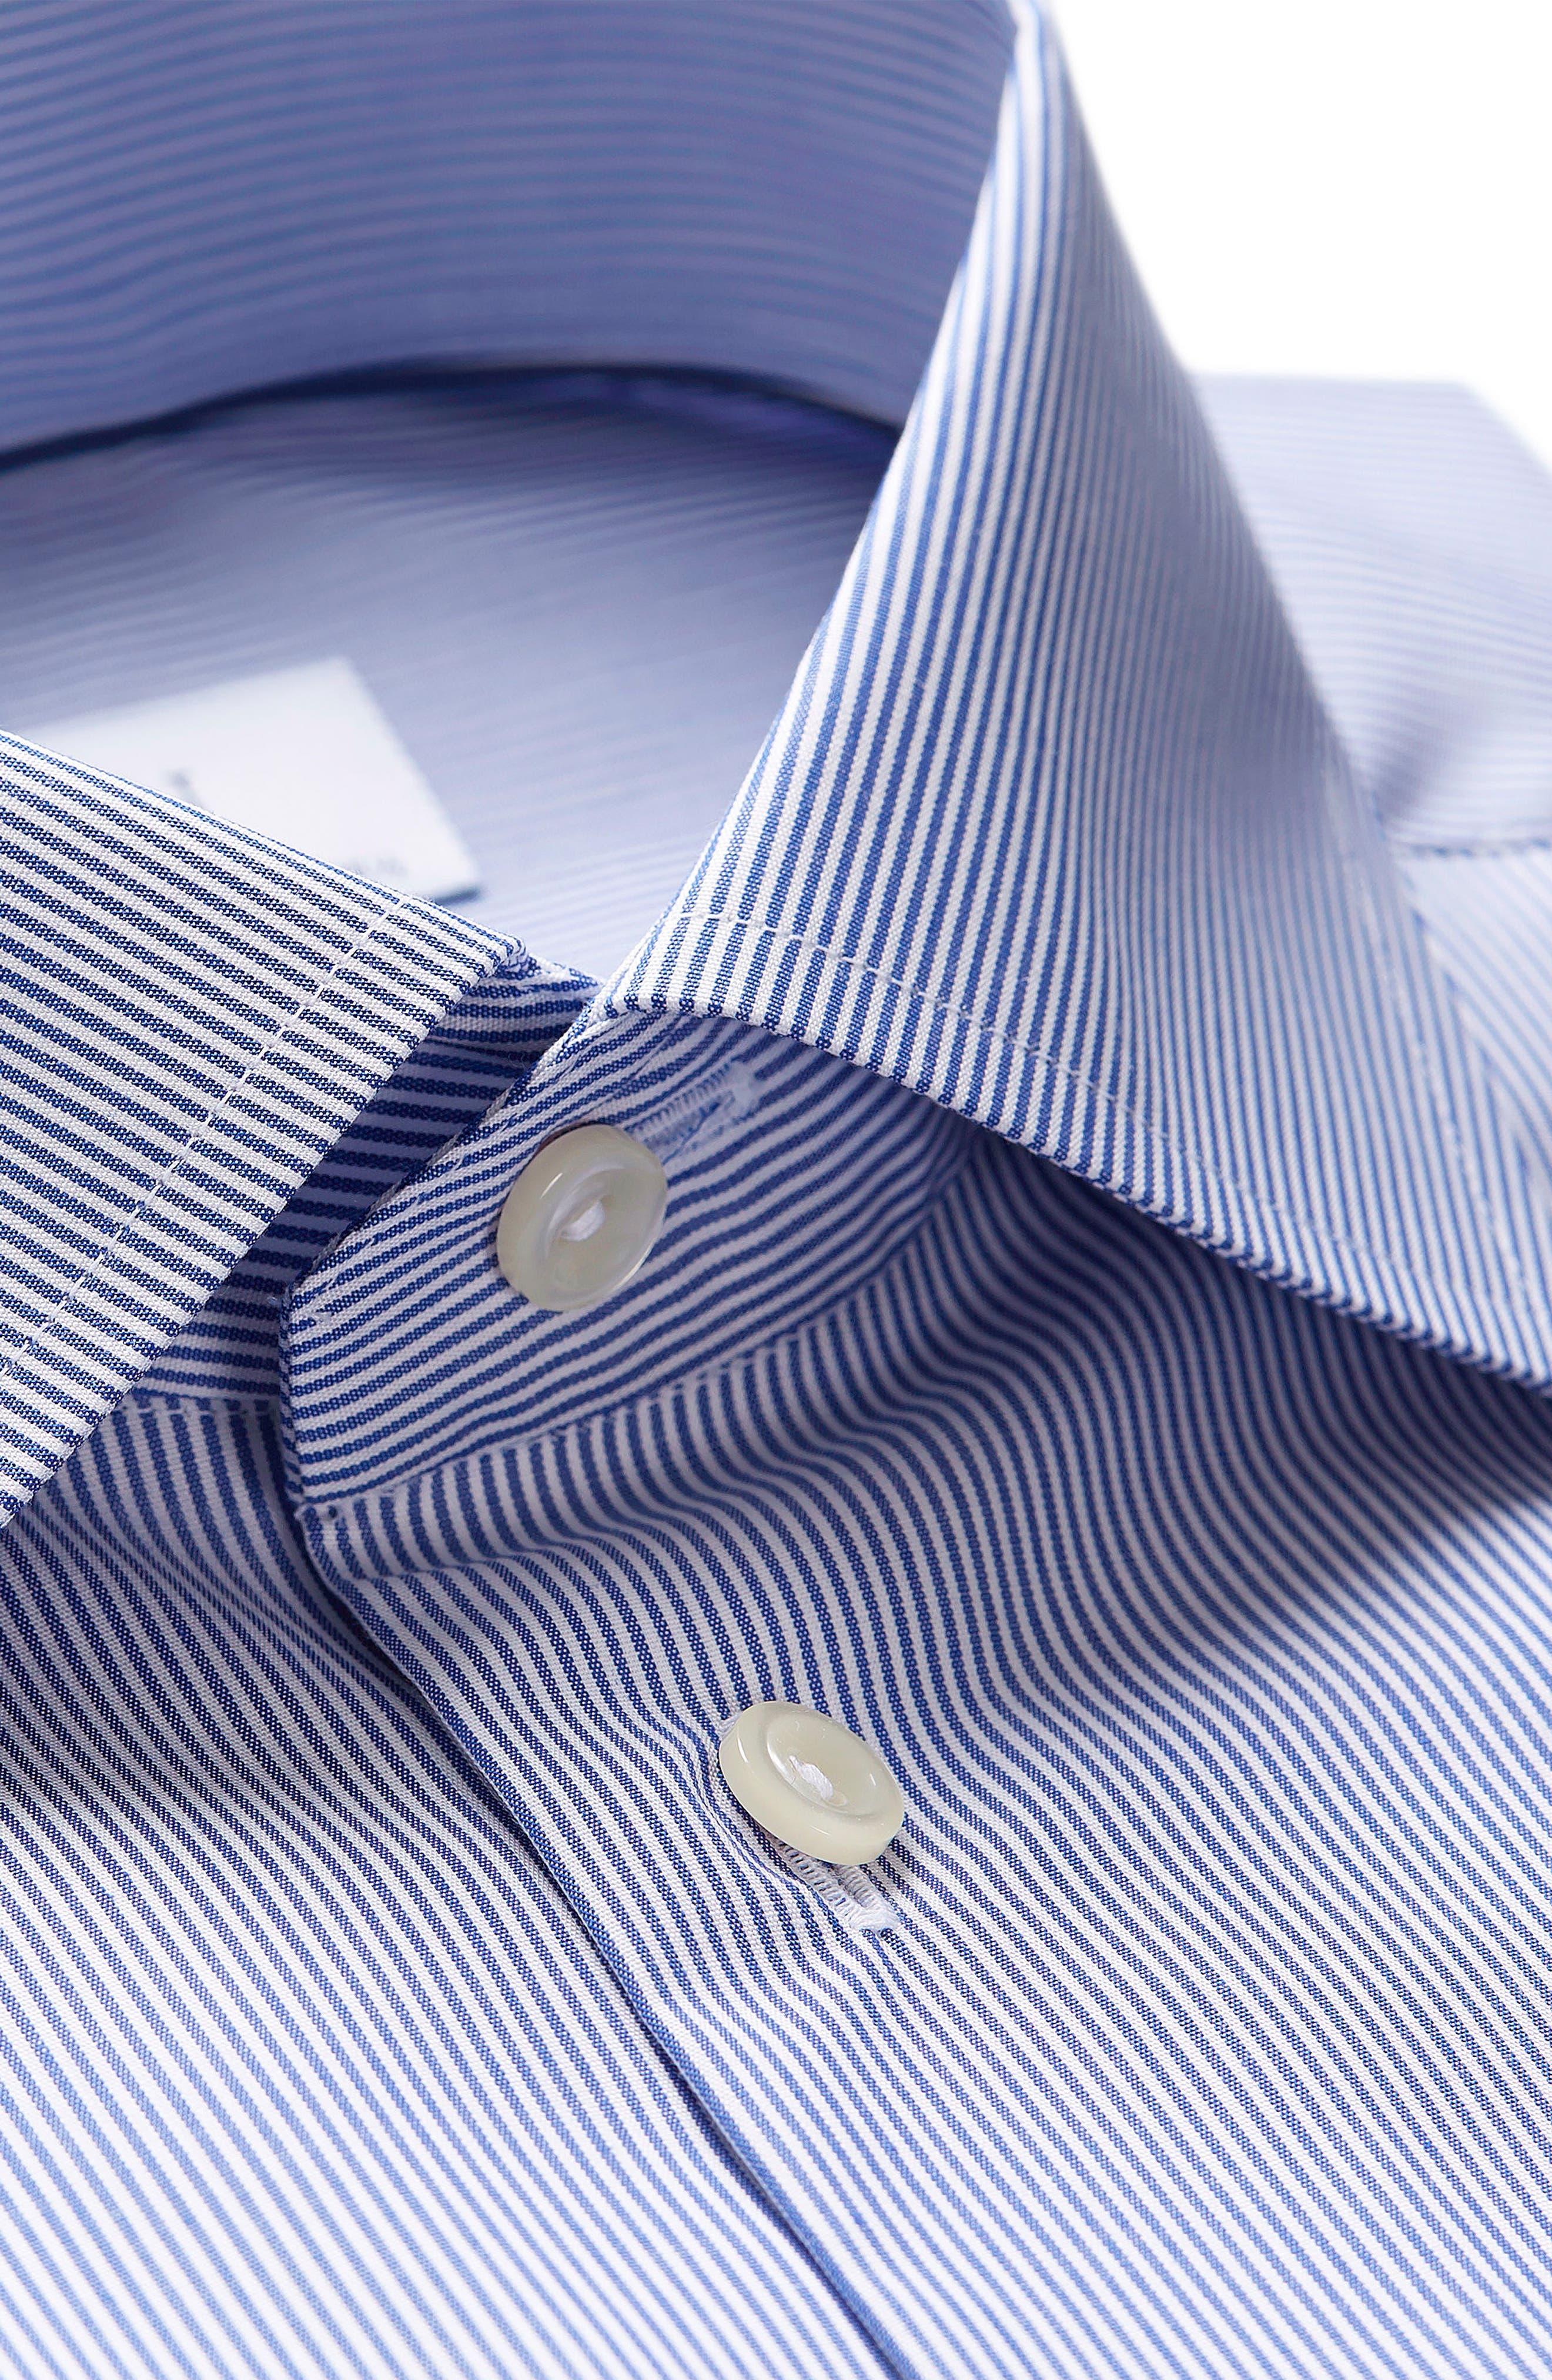 Extra Slim Fit Stripe Dress Shirt,                             Alternate thumbnail 2, color,                             Blue/ White